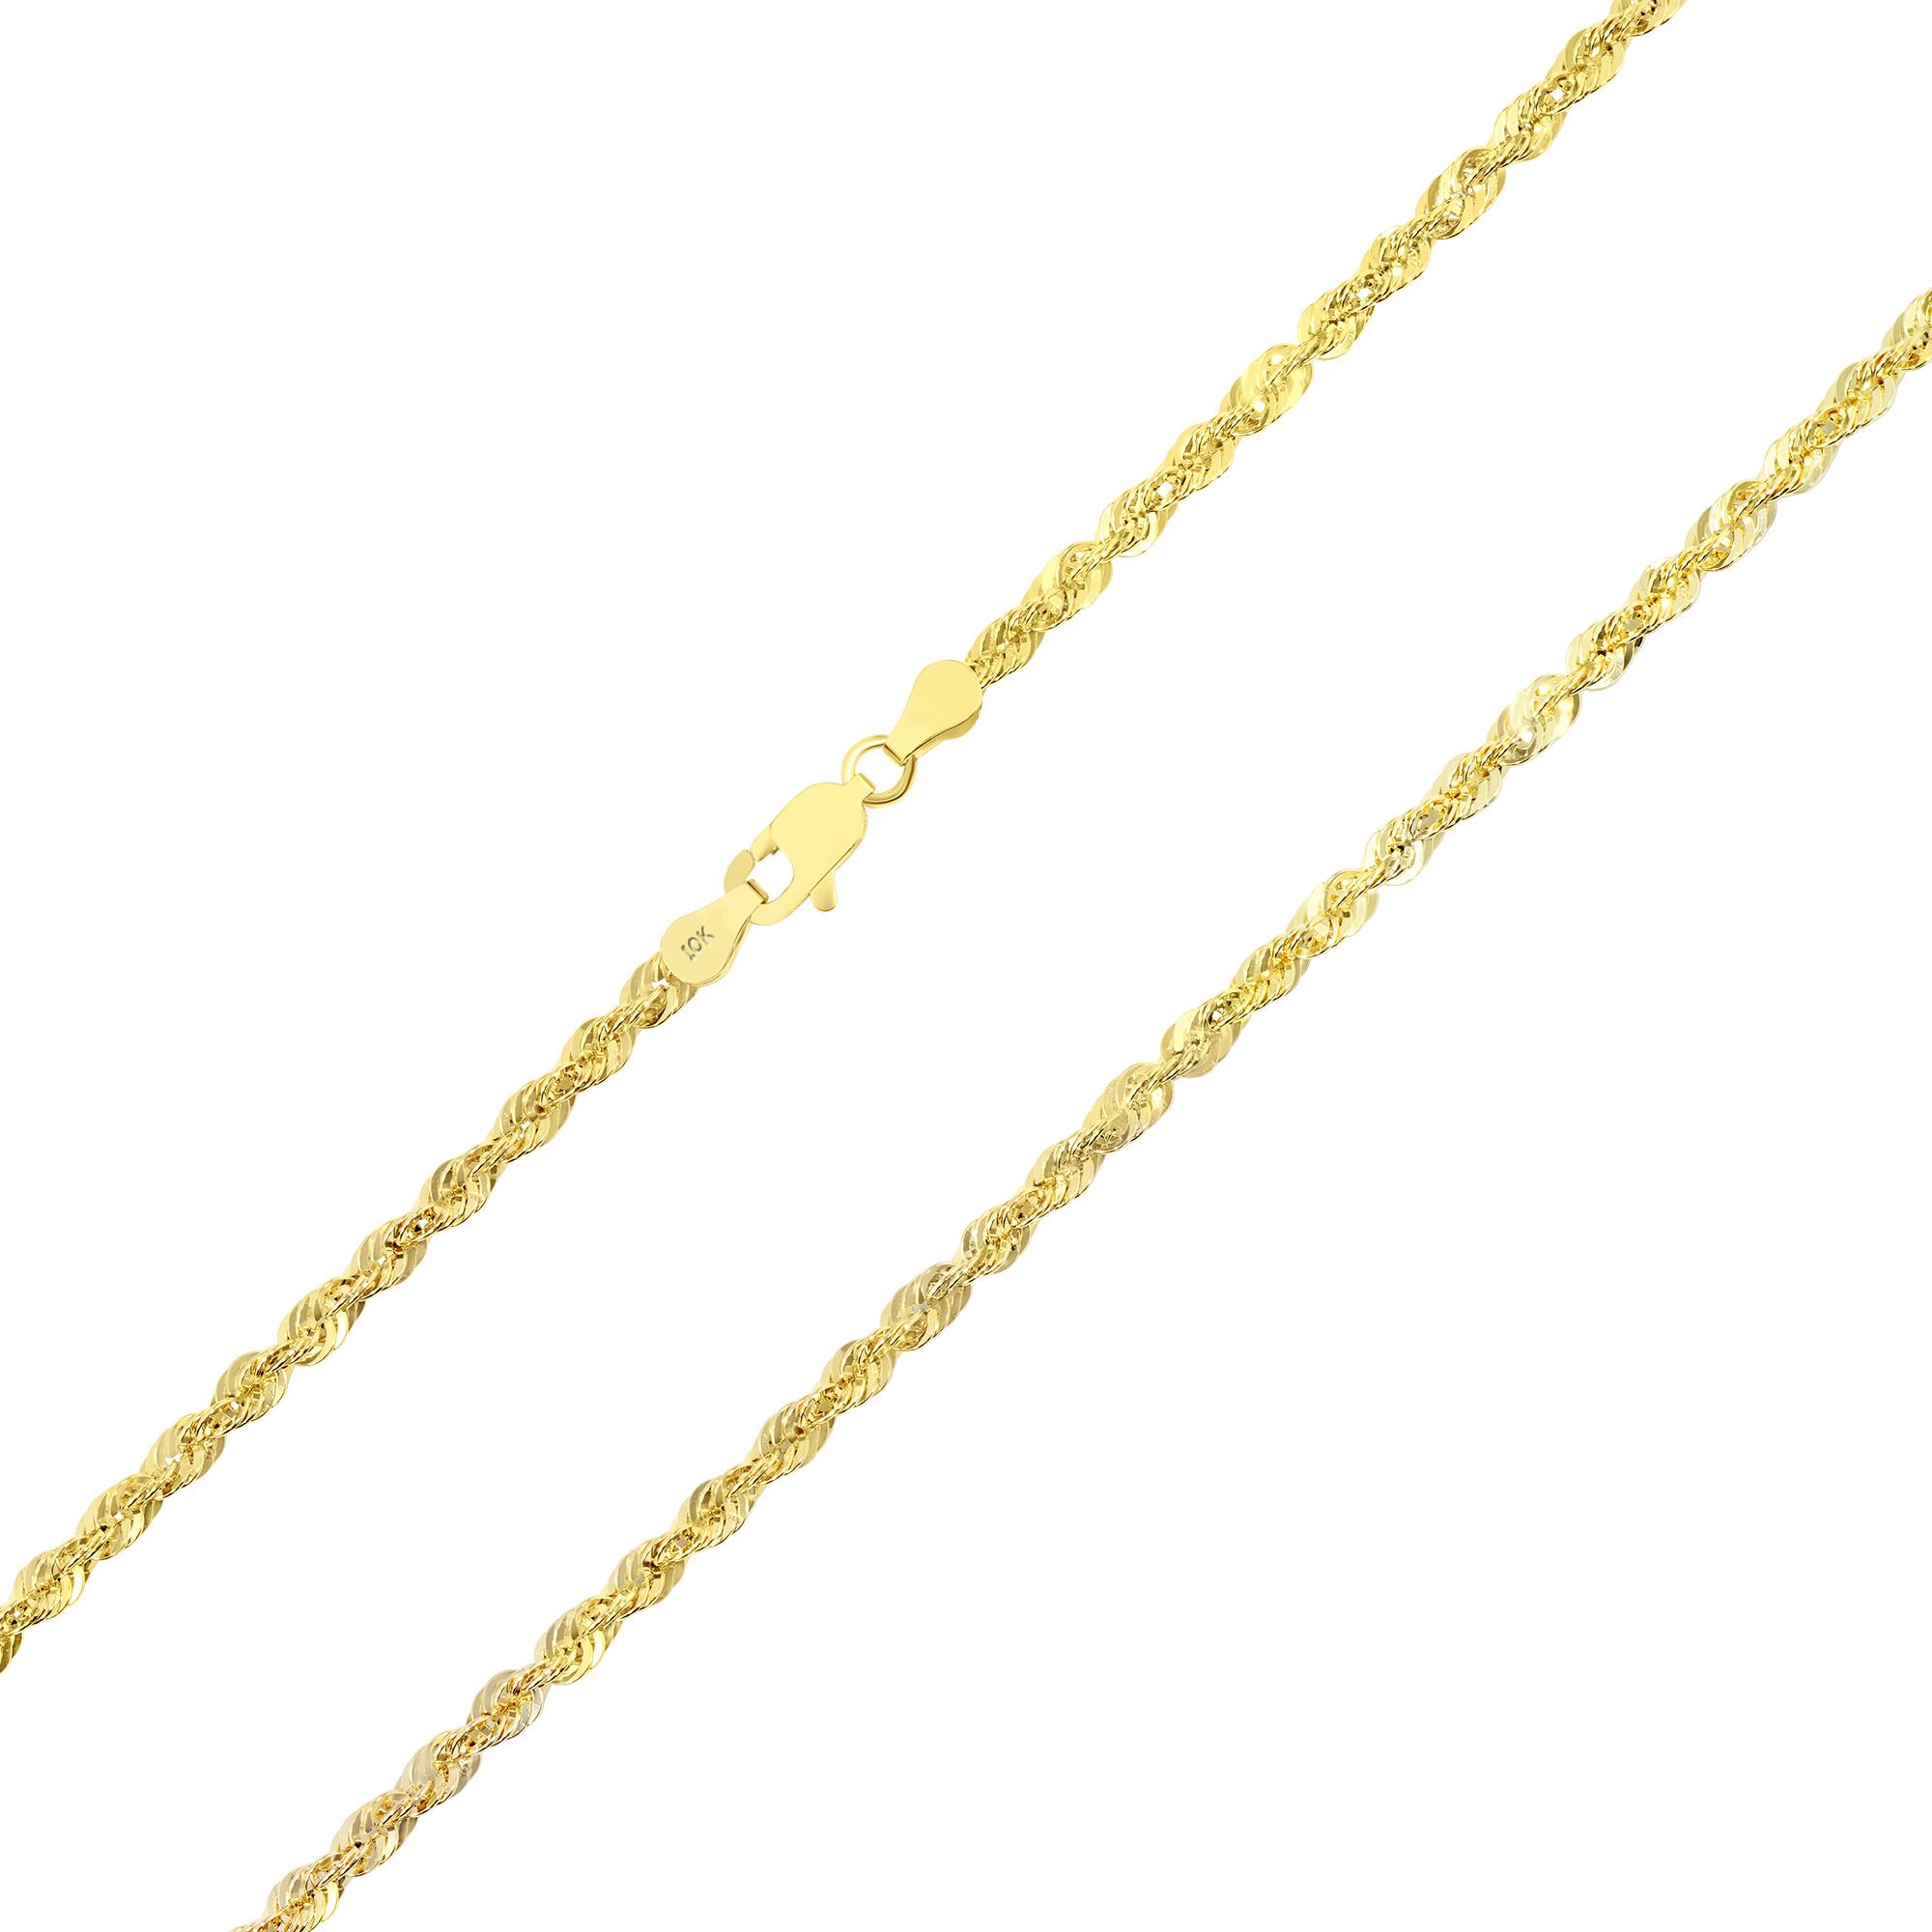 "10K Yellow Gold Light 1.5mm-4mm Diamond Cut Rope Chain Pendant Necklace 14""- 30"" 5"